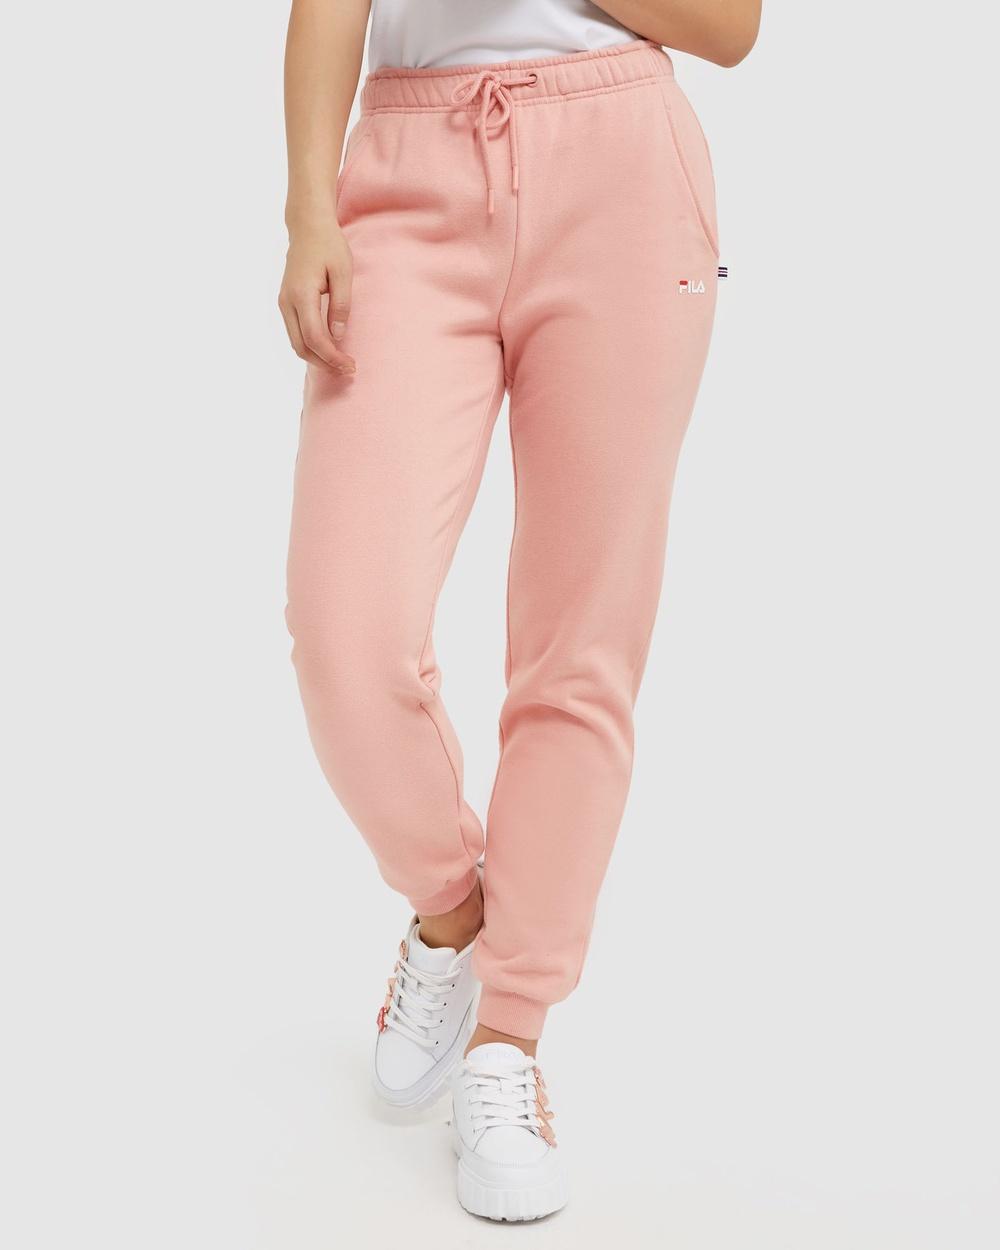 Fila Classic Pants Sweatpants Mellow Rose Australia